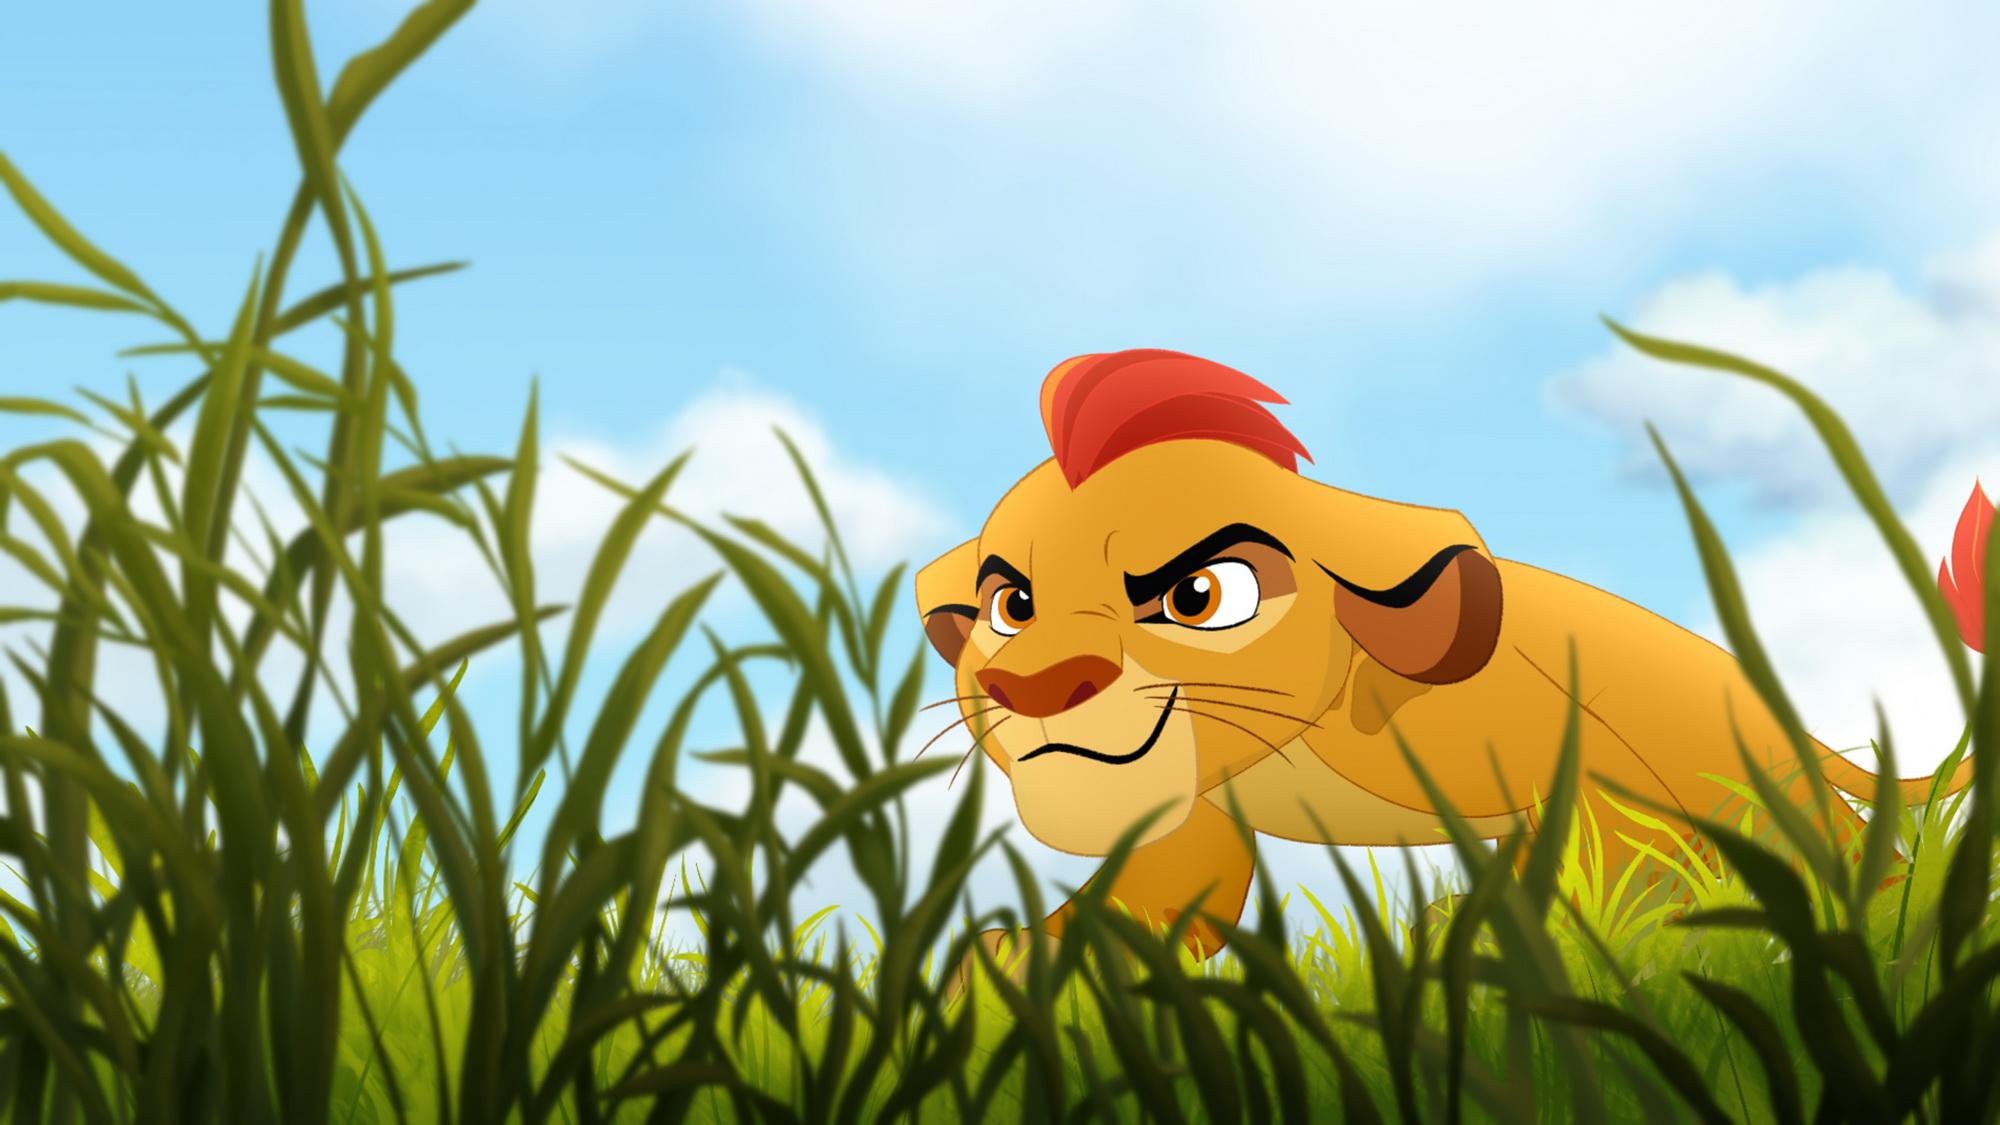 lion king 3 1080p online